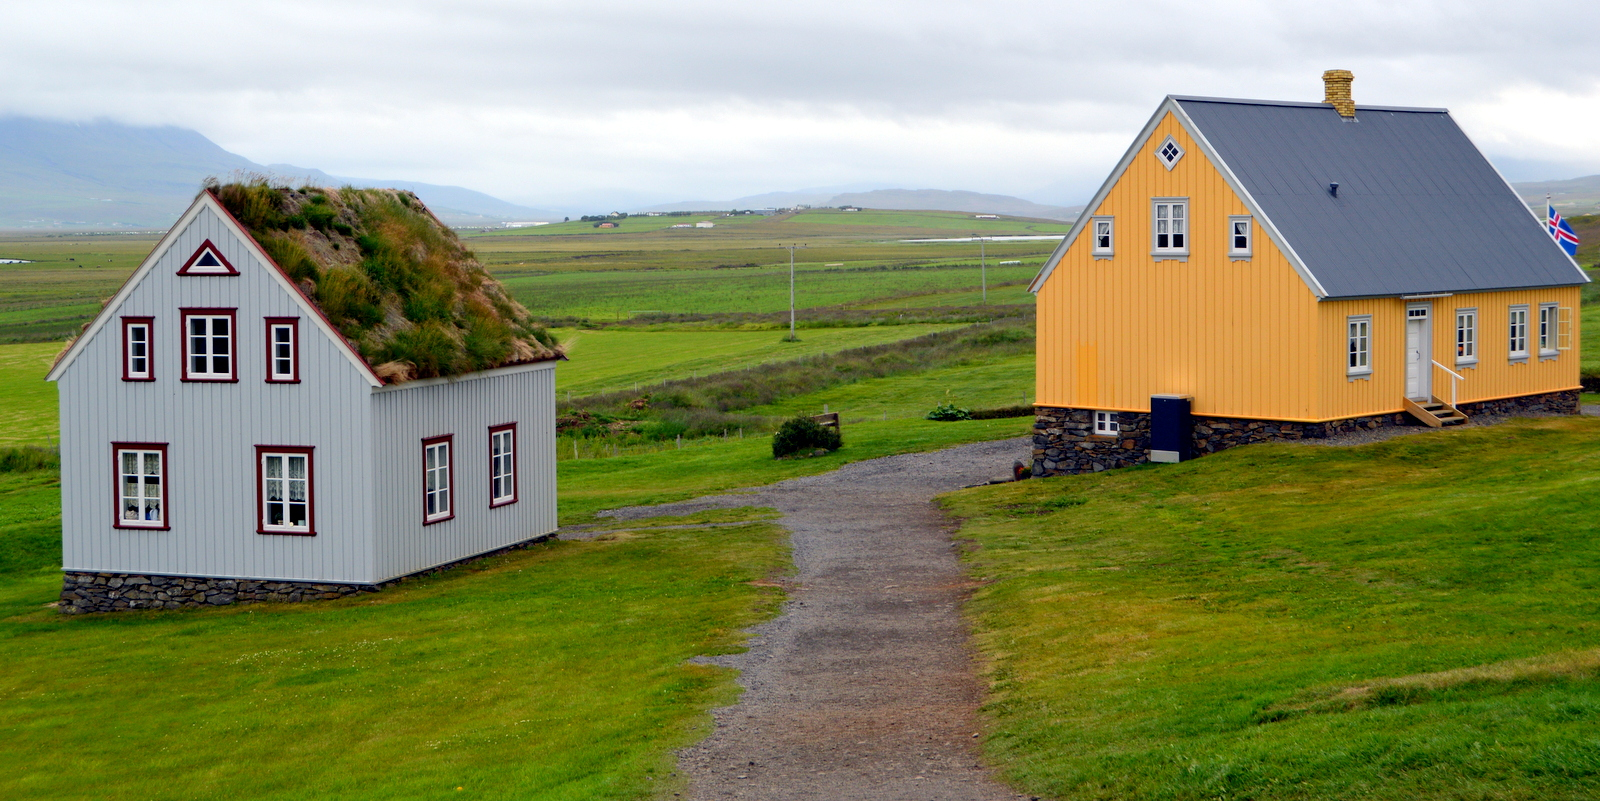 Glaumbaer In Skagafjorur In North Iceland on Icelandic Turf House